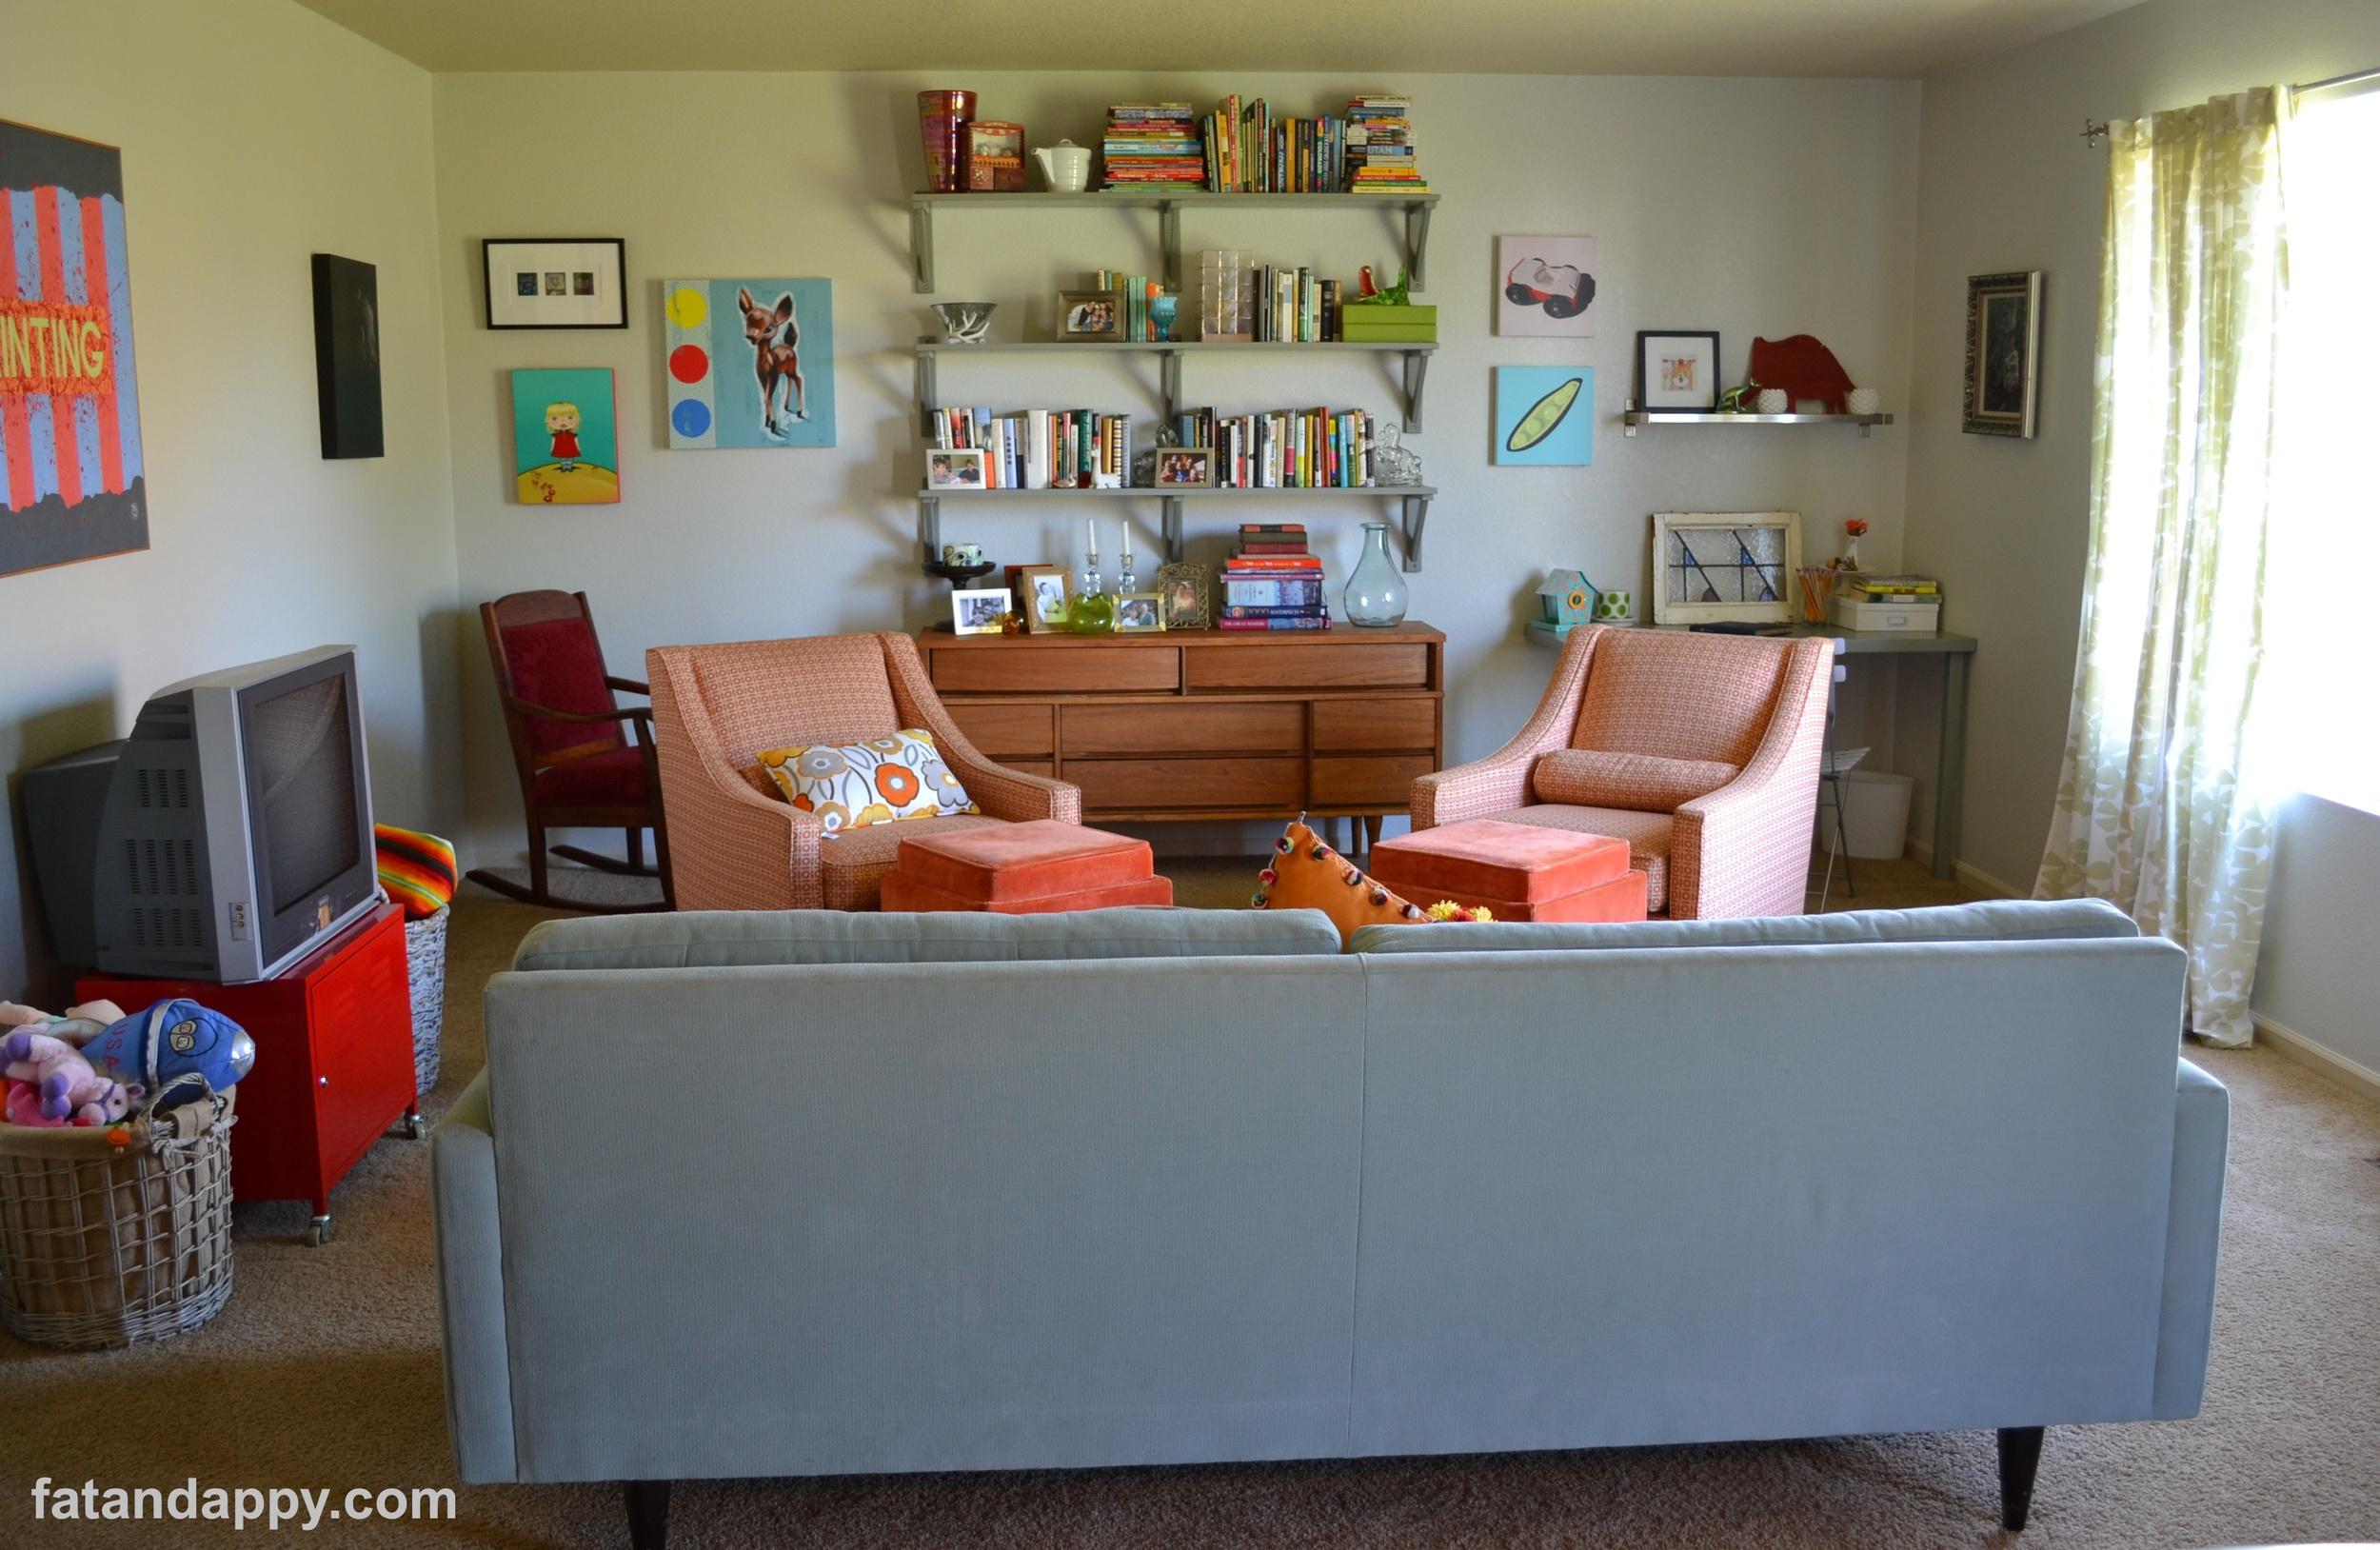 A modern family room